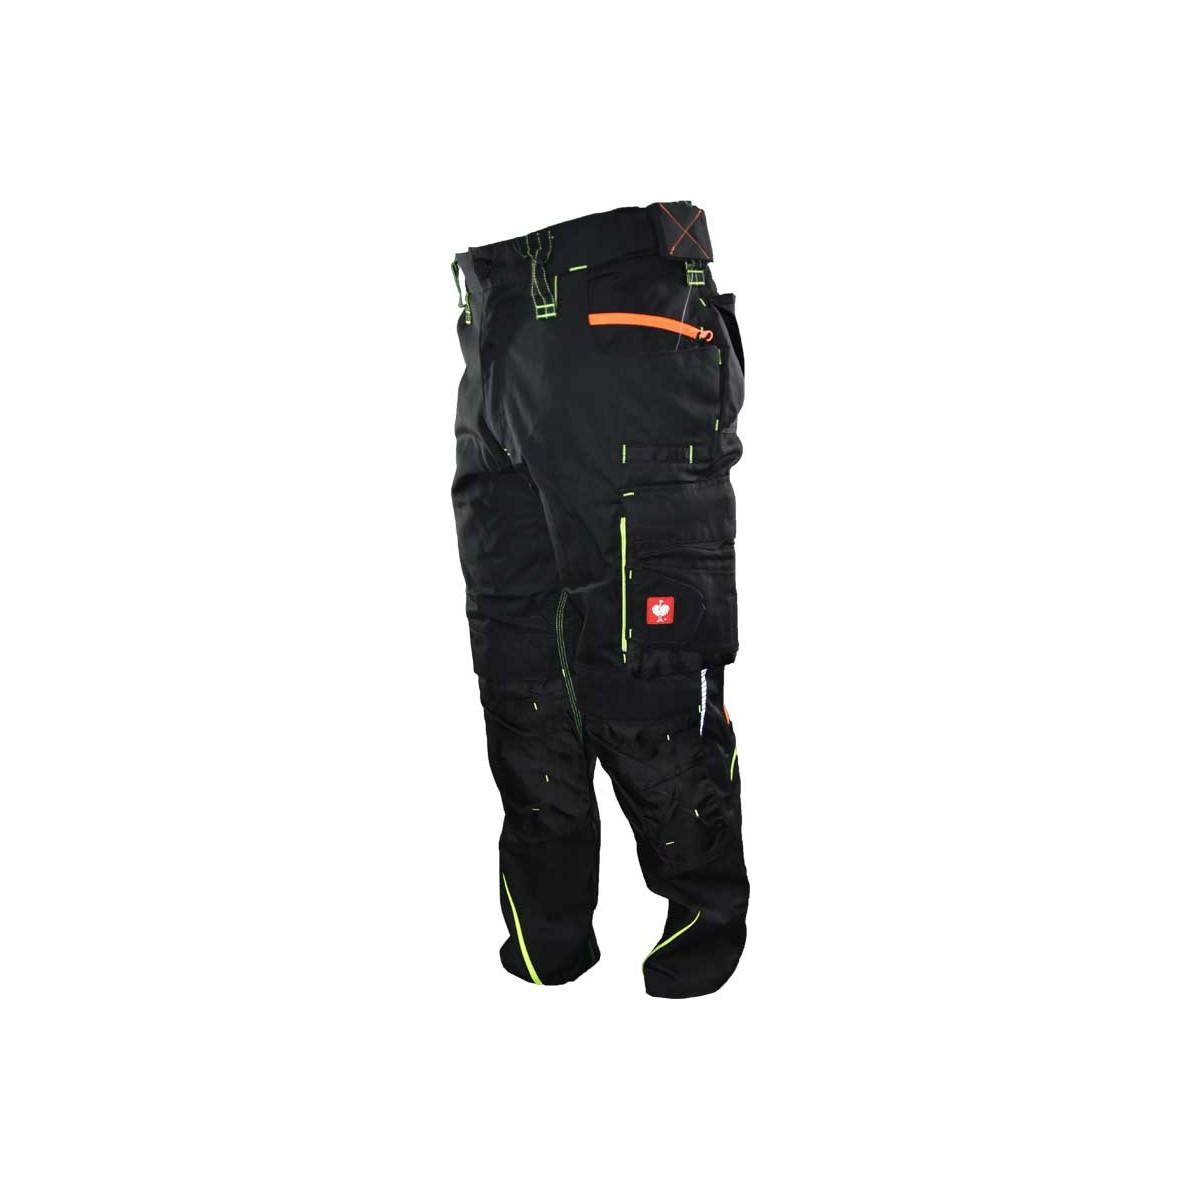 Spodnie rozm. 56, Motion STRAUSS - 65511 Spodnie rozm. 56, Motion STRAUSS - 65511